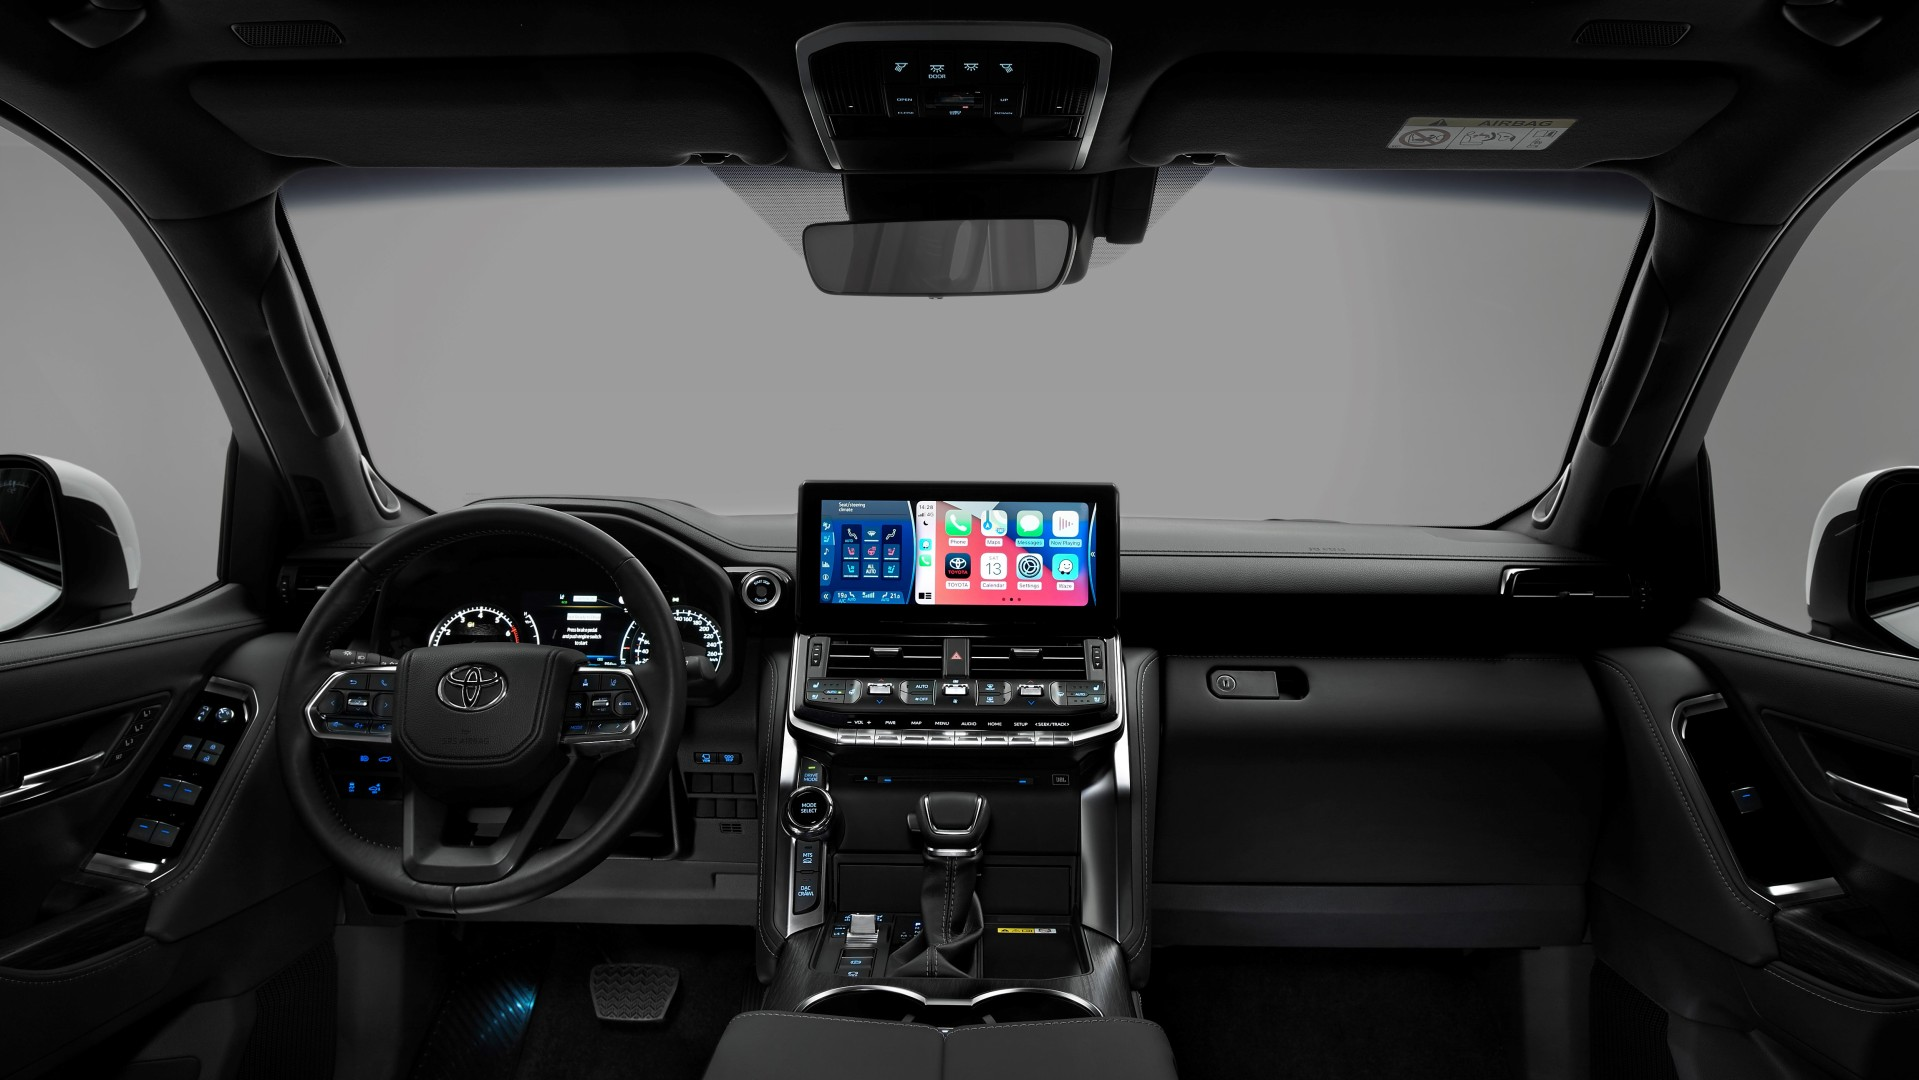 Toyota Land Cruiser 300 2022 (18)